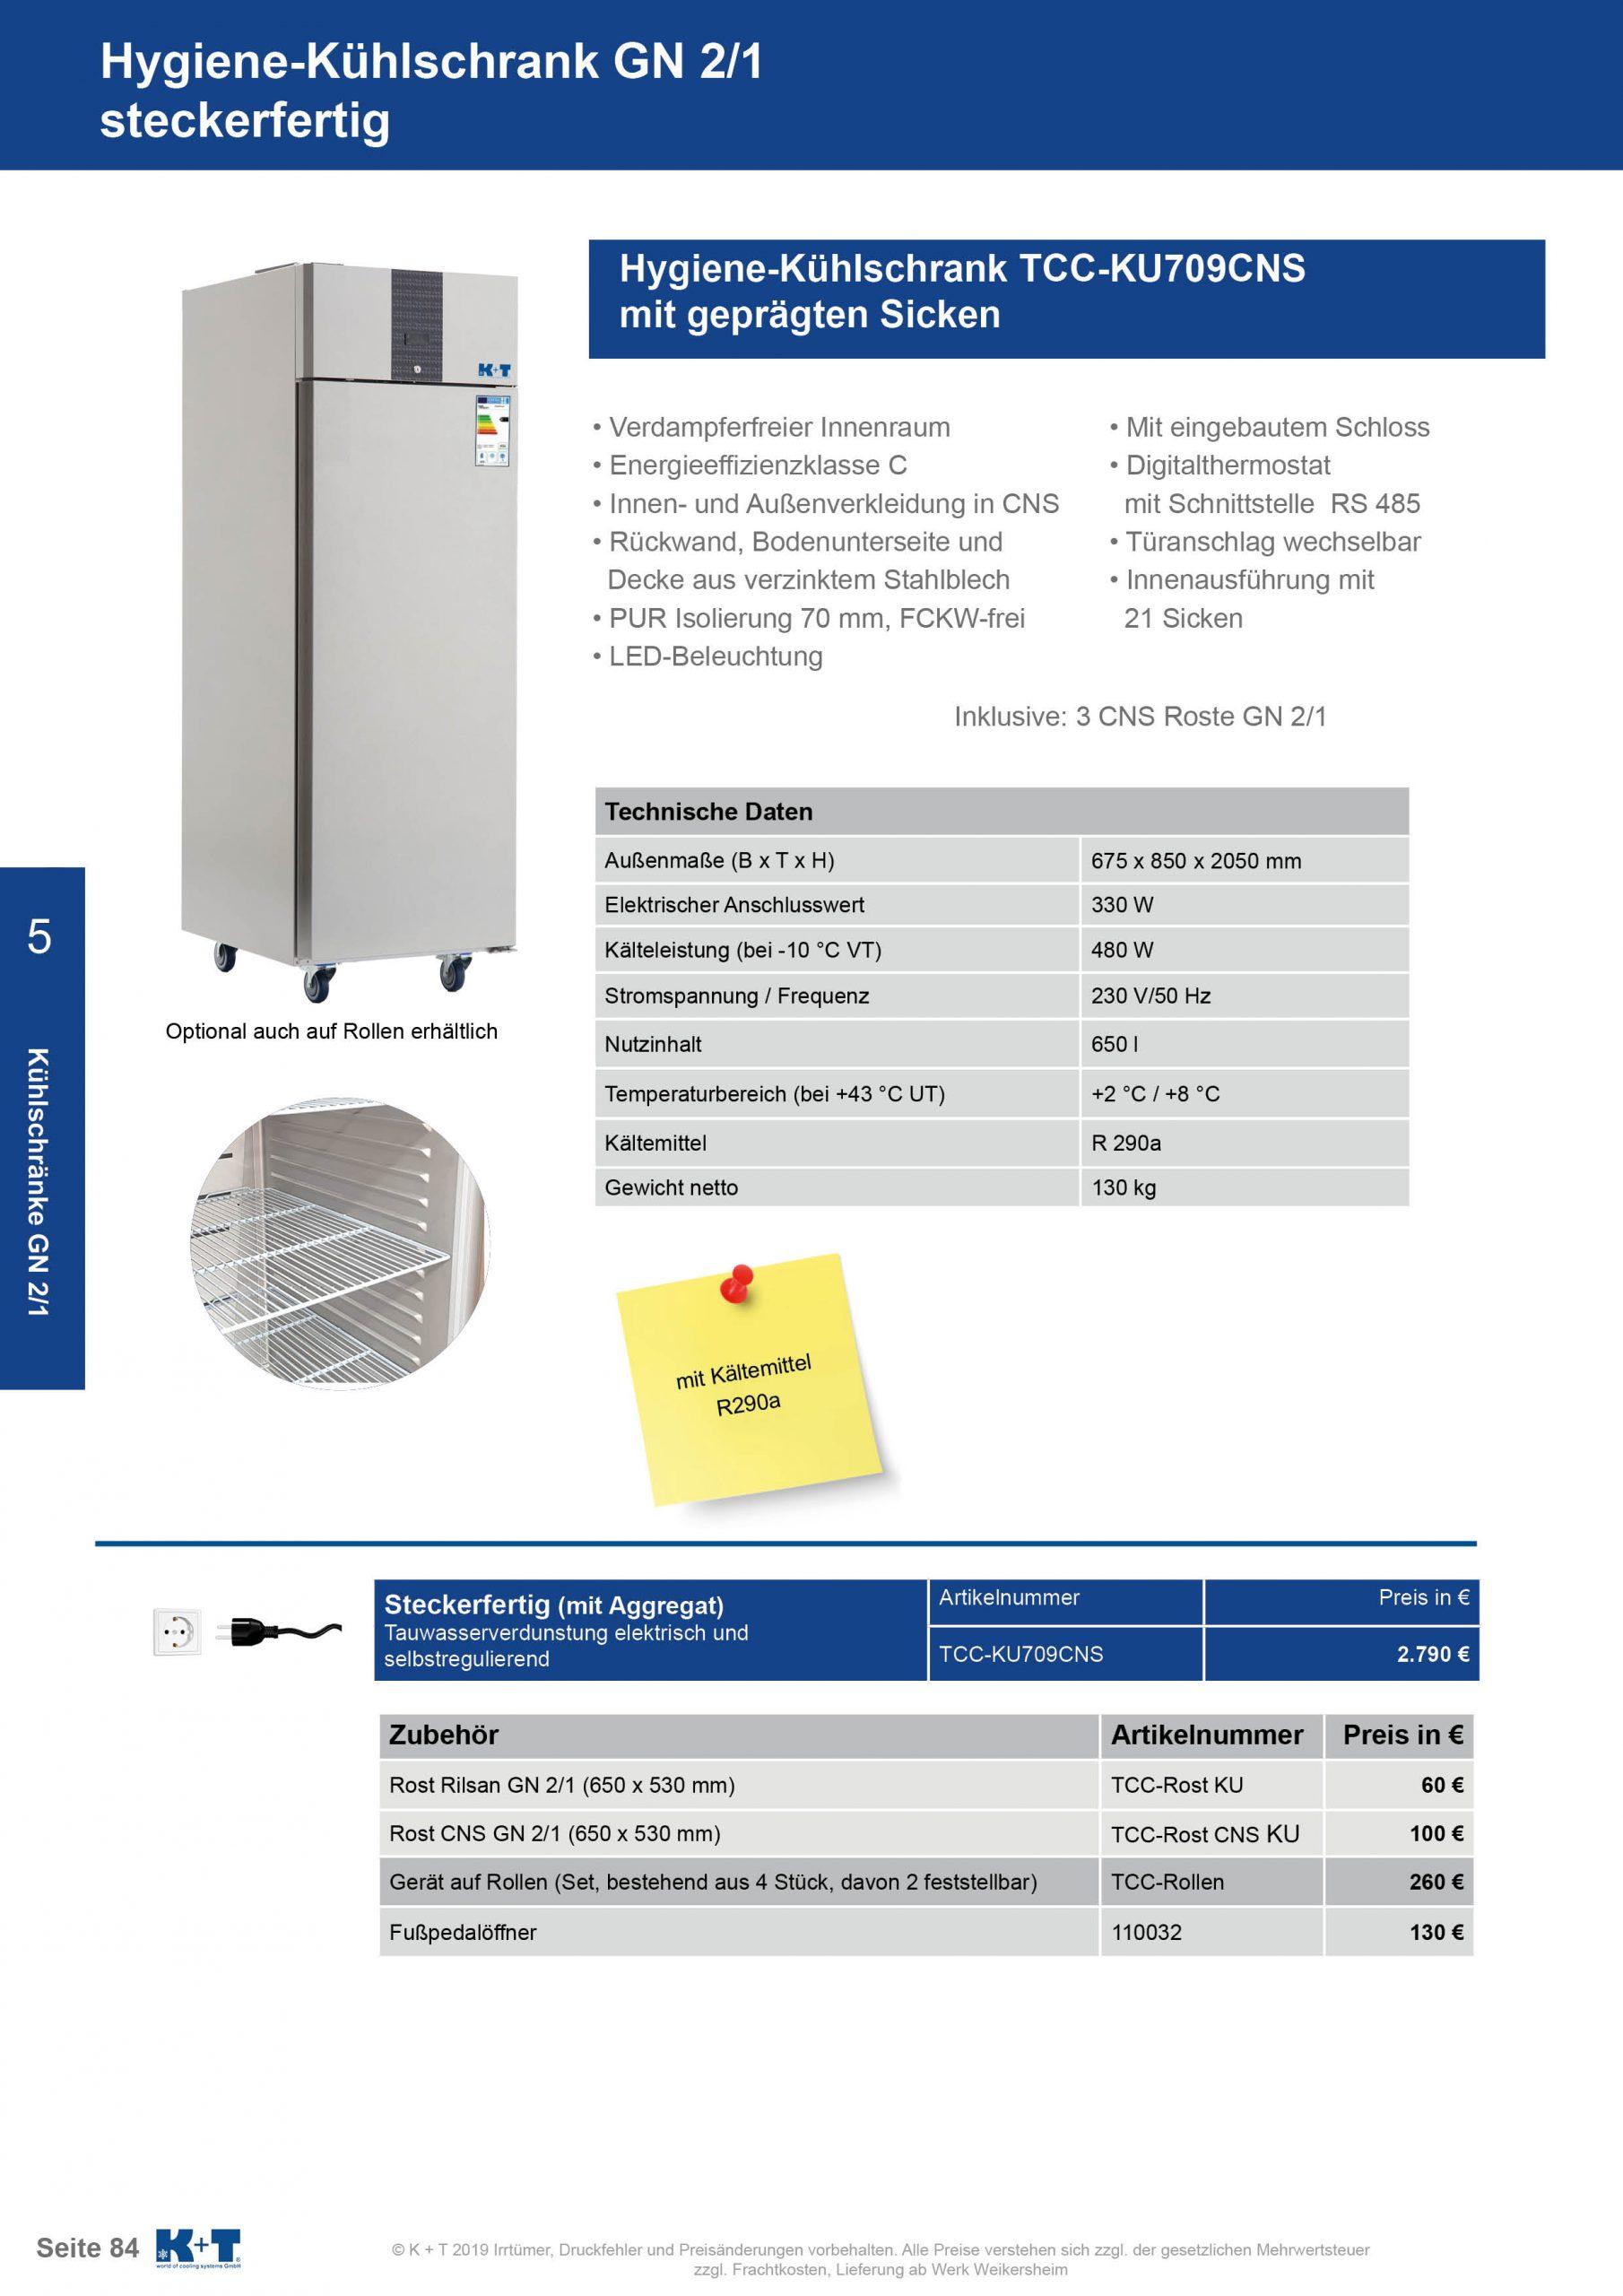 Kühlschränke GN 2_1 Hygienekühlschrank steckerfertig